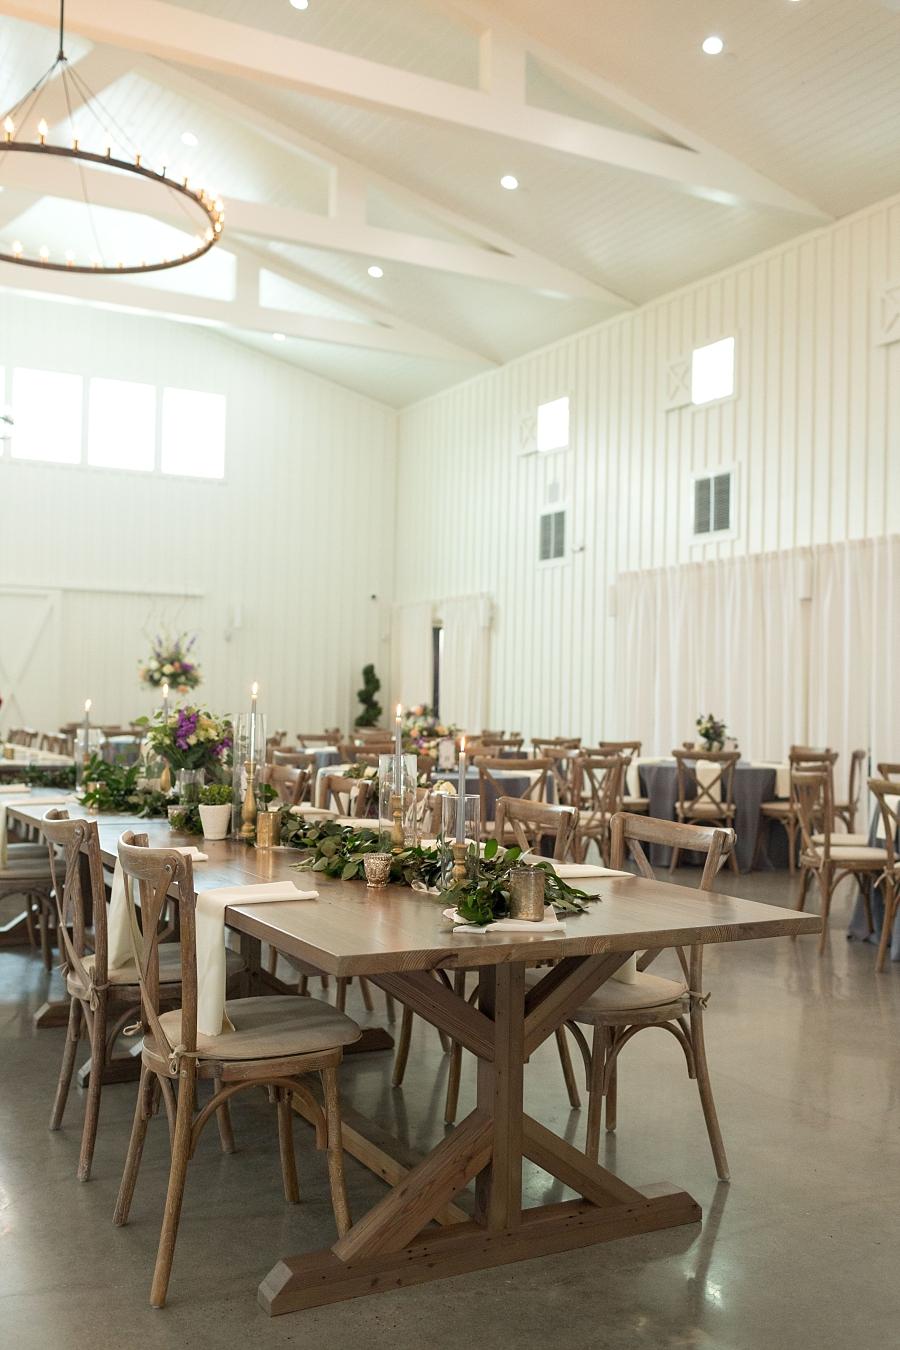 Stacy-Anderson-Photography-The-Farmhouse-Houston-Wedding-Photographer_0047.jpg